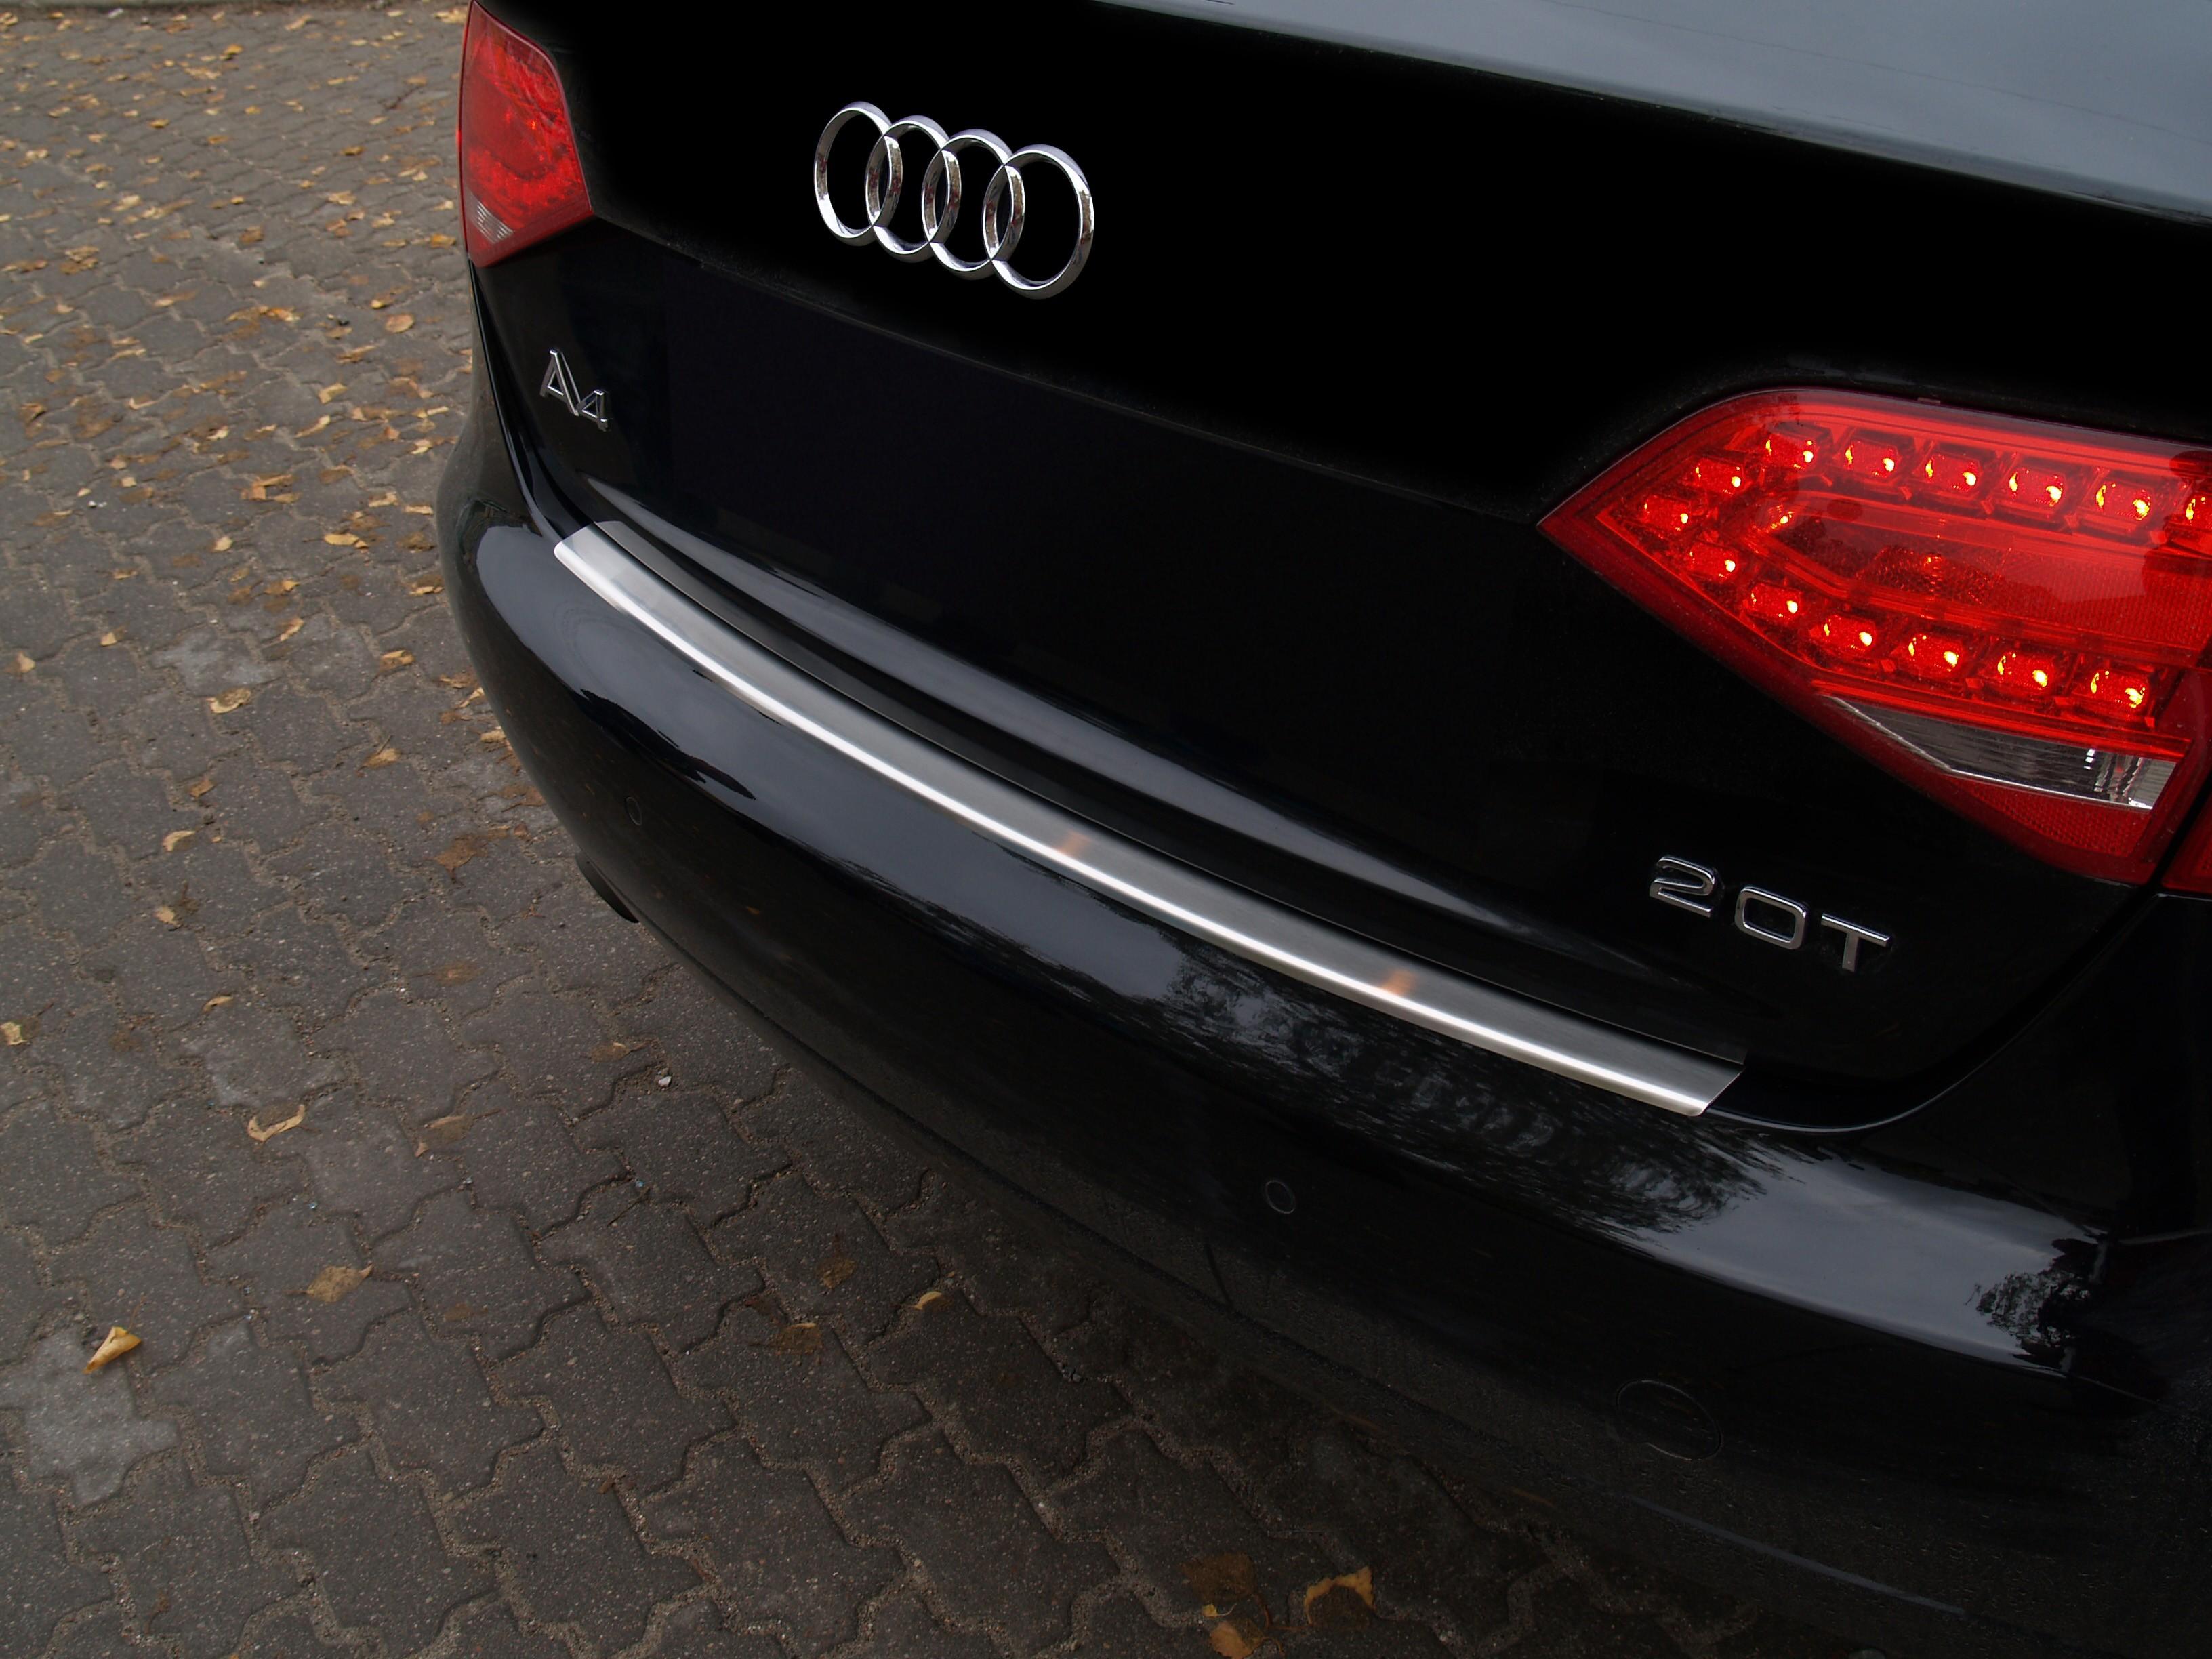 AUDI A4 B8 Sedan - bilstyle